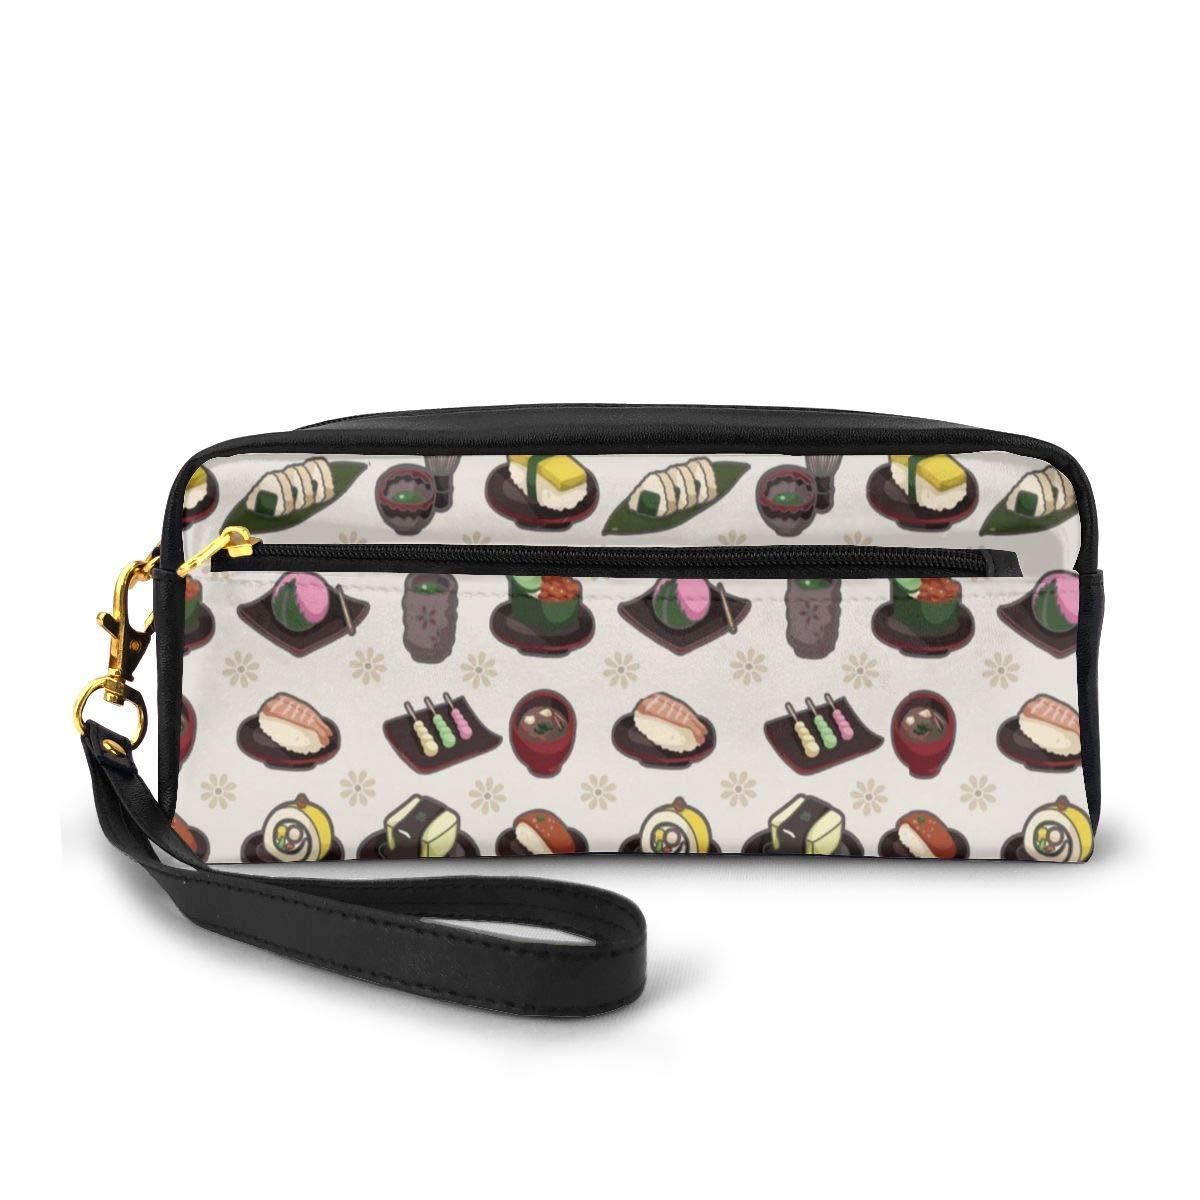 Japanese Food Canvas Makeup Bag Pouch Purse Handbag Organizer with Zipper